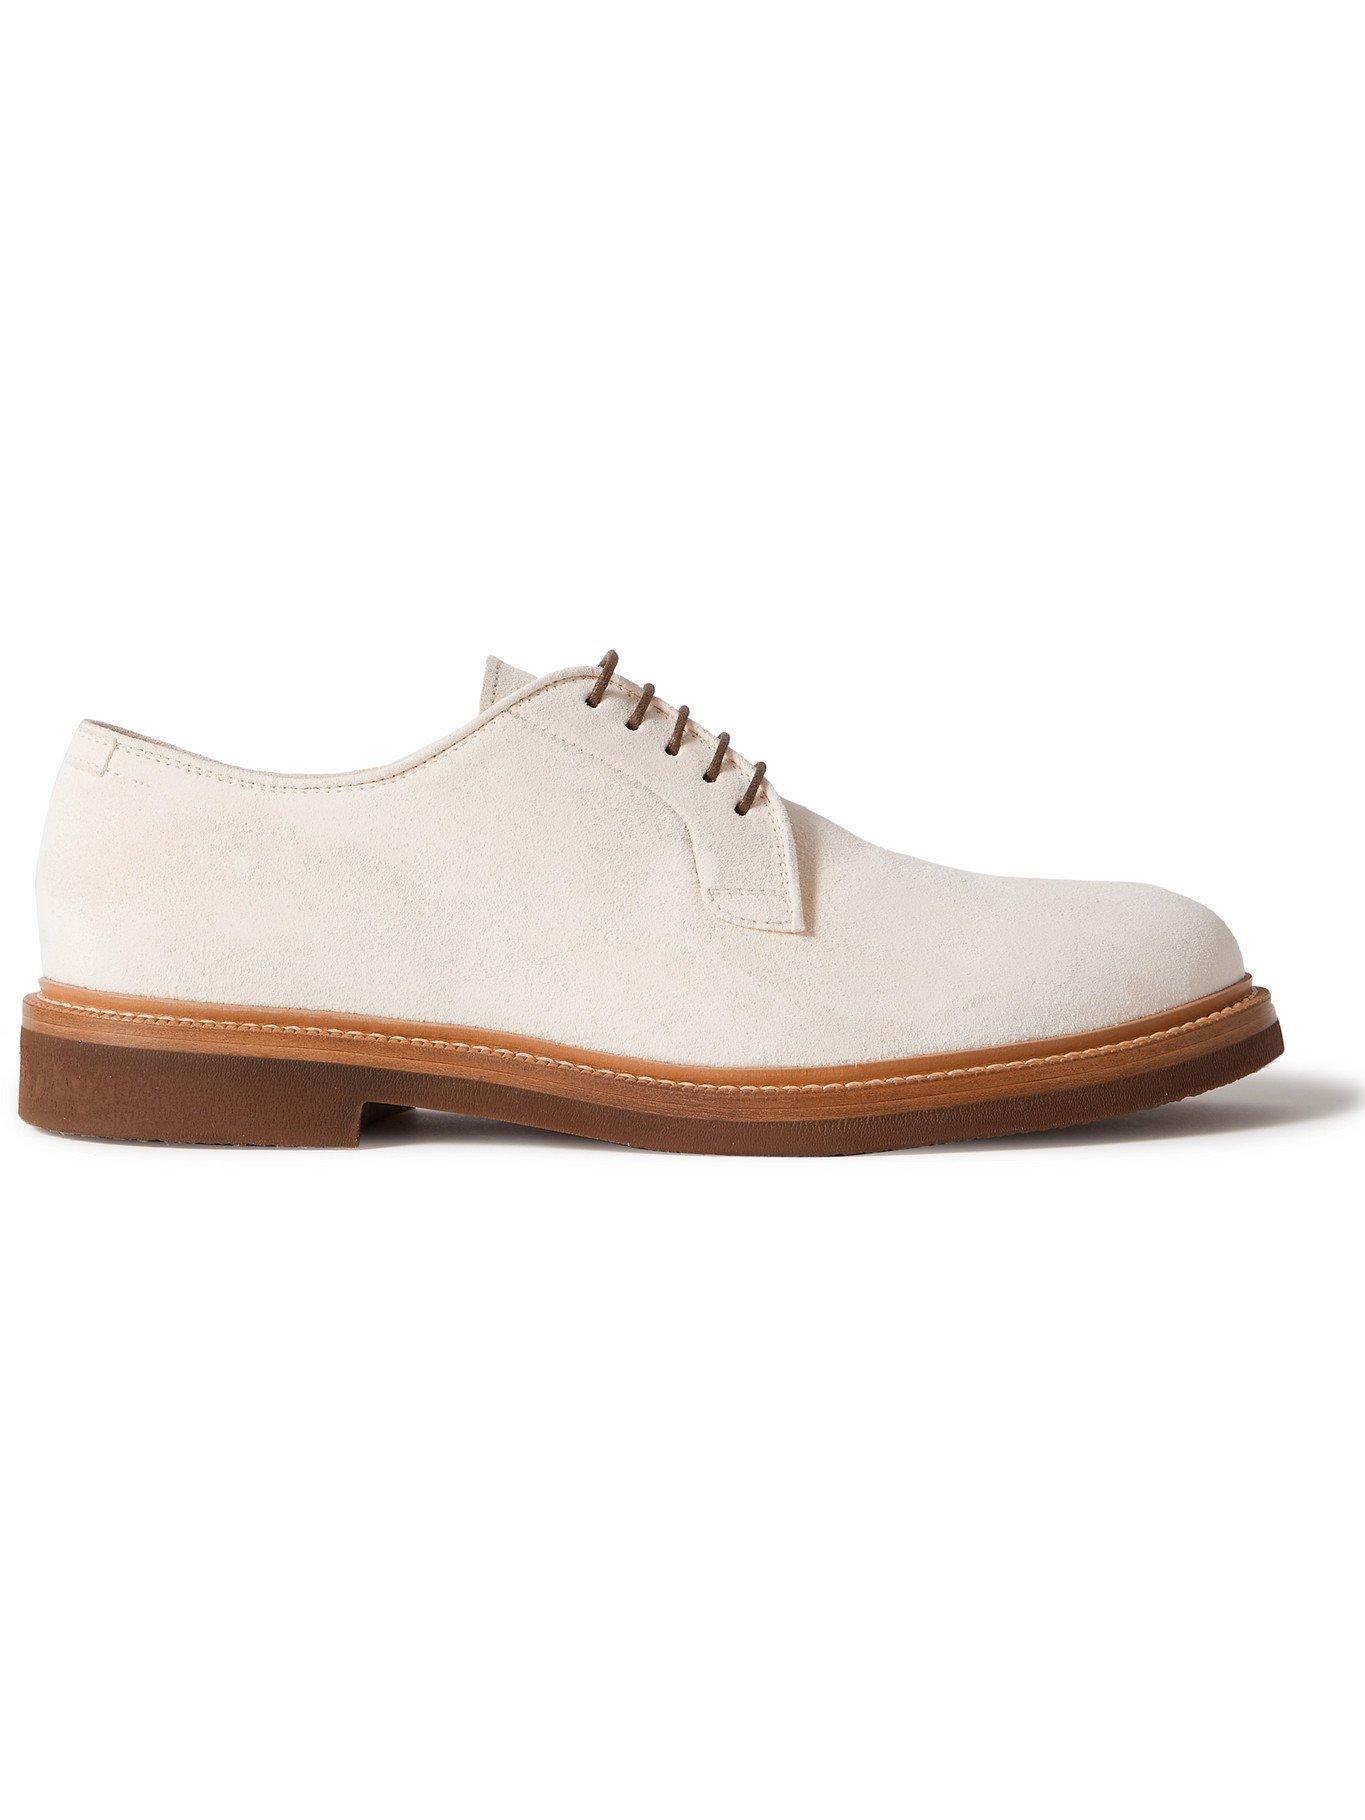 Photo: BRUNELLO CUCINELLI - Suede Derby Shoes - White